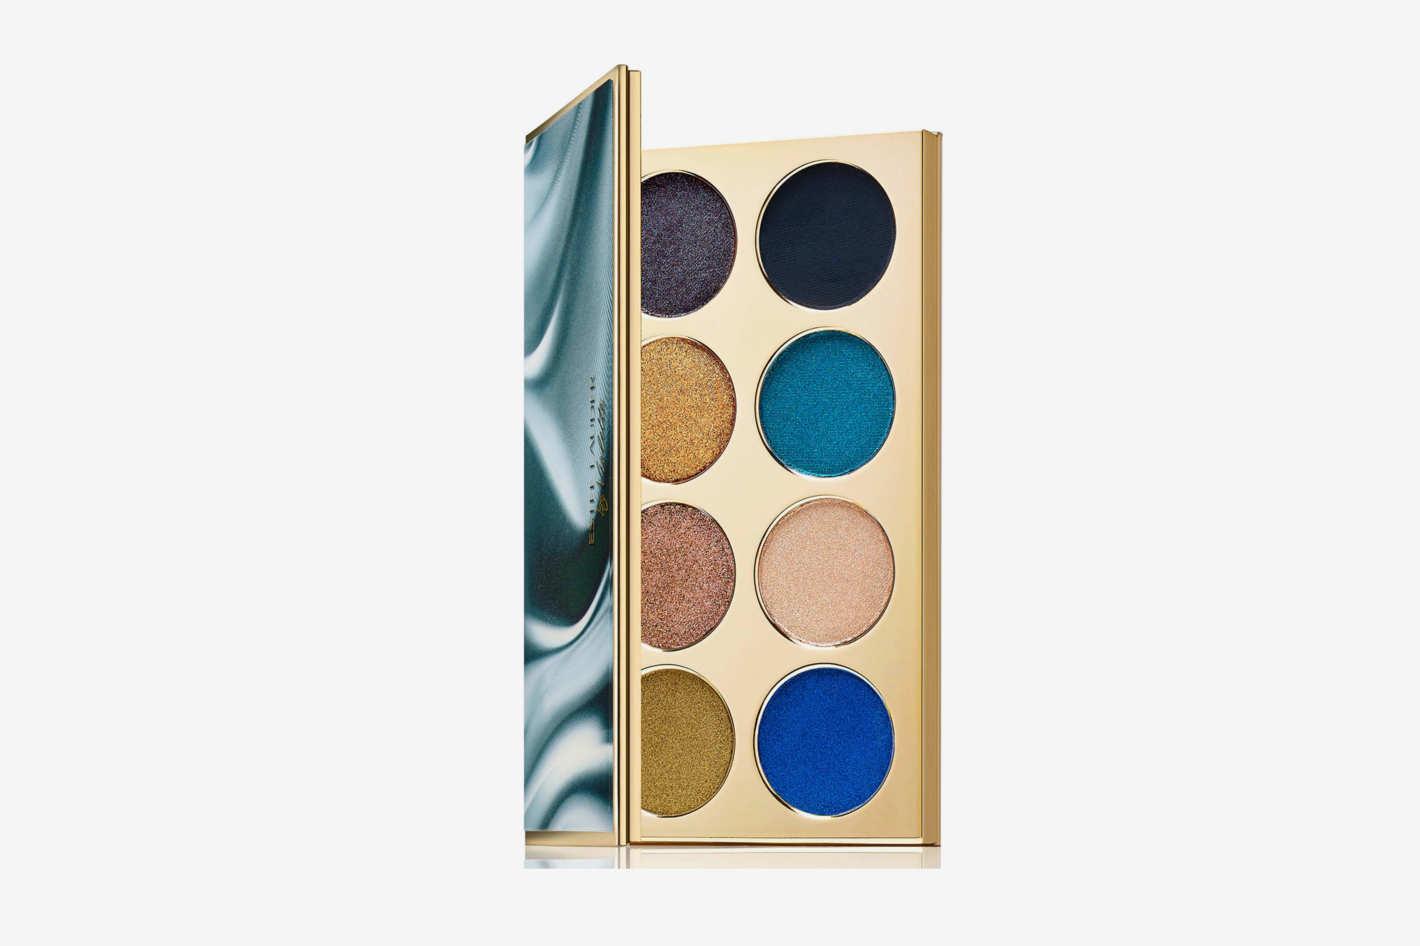 Violette La Dangereuse Eyeshadow Palette in Blue Dahlia